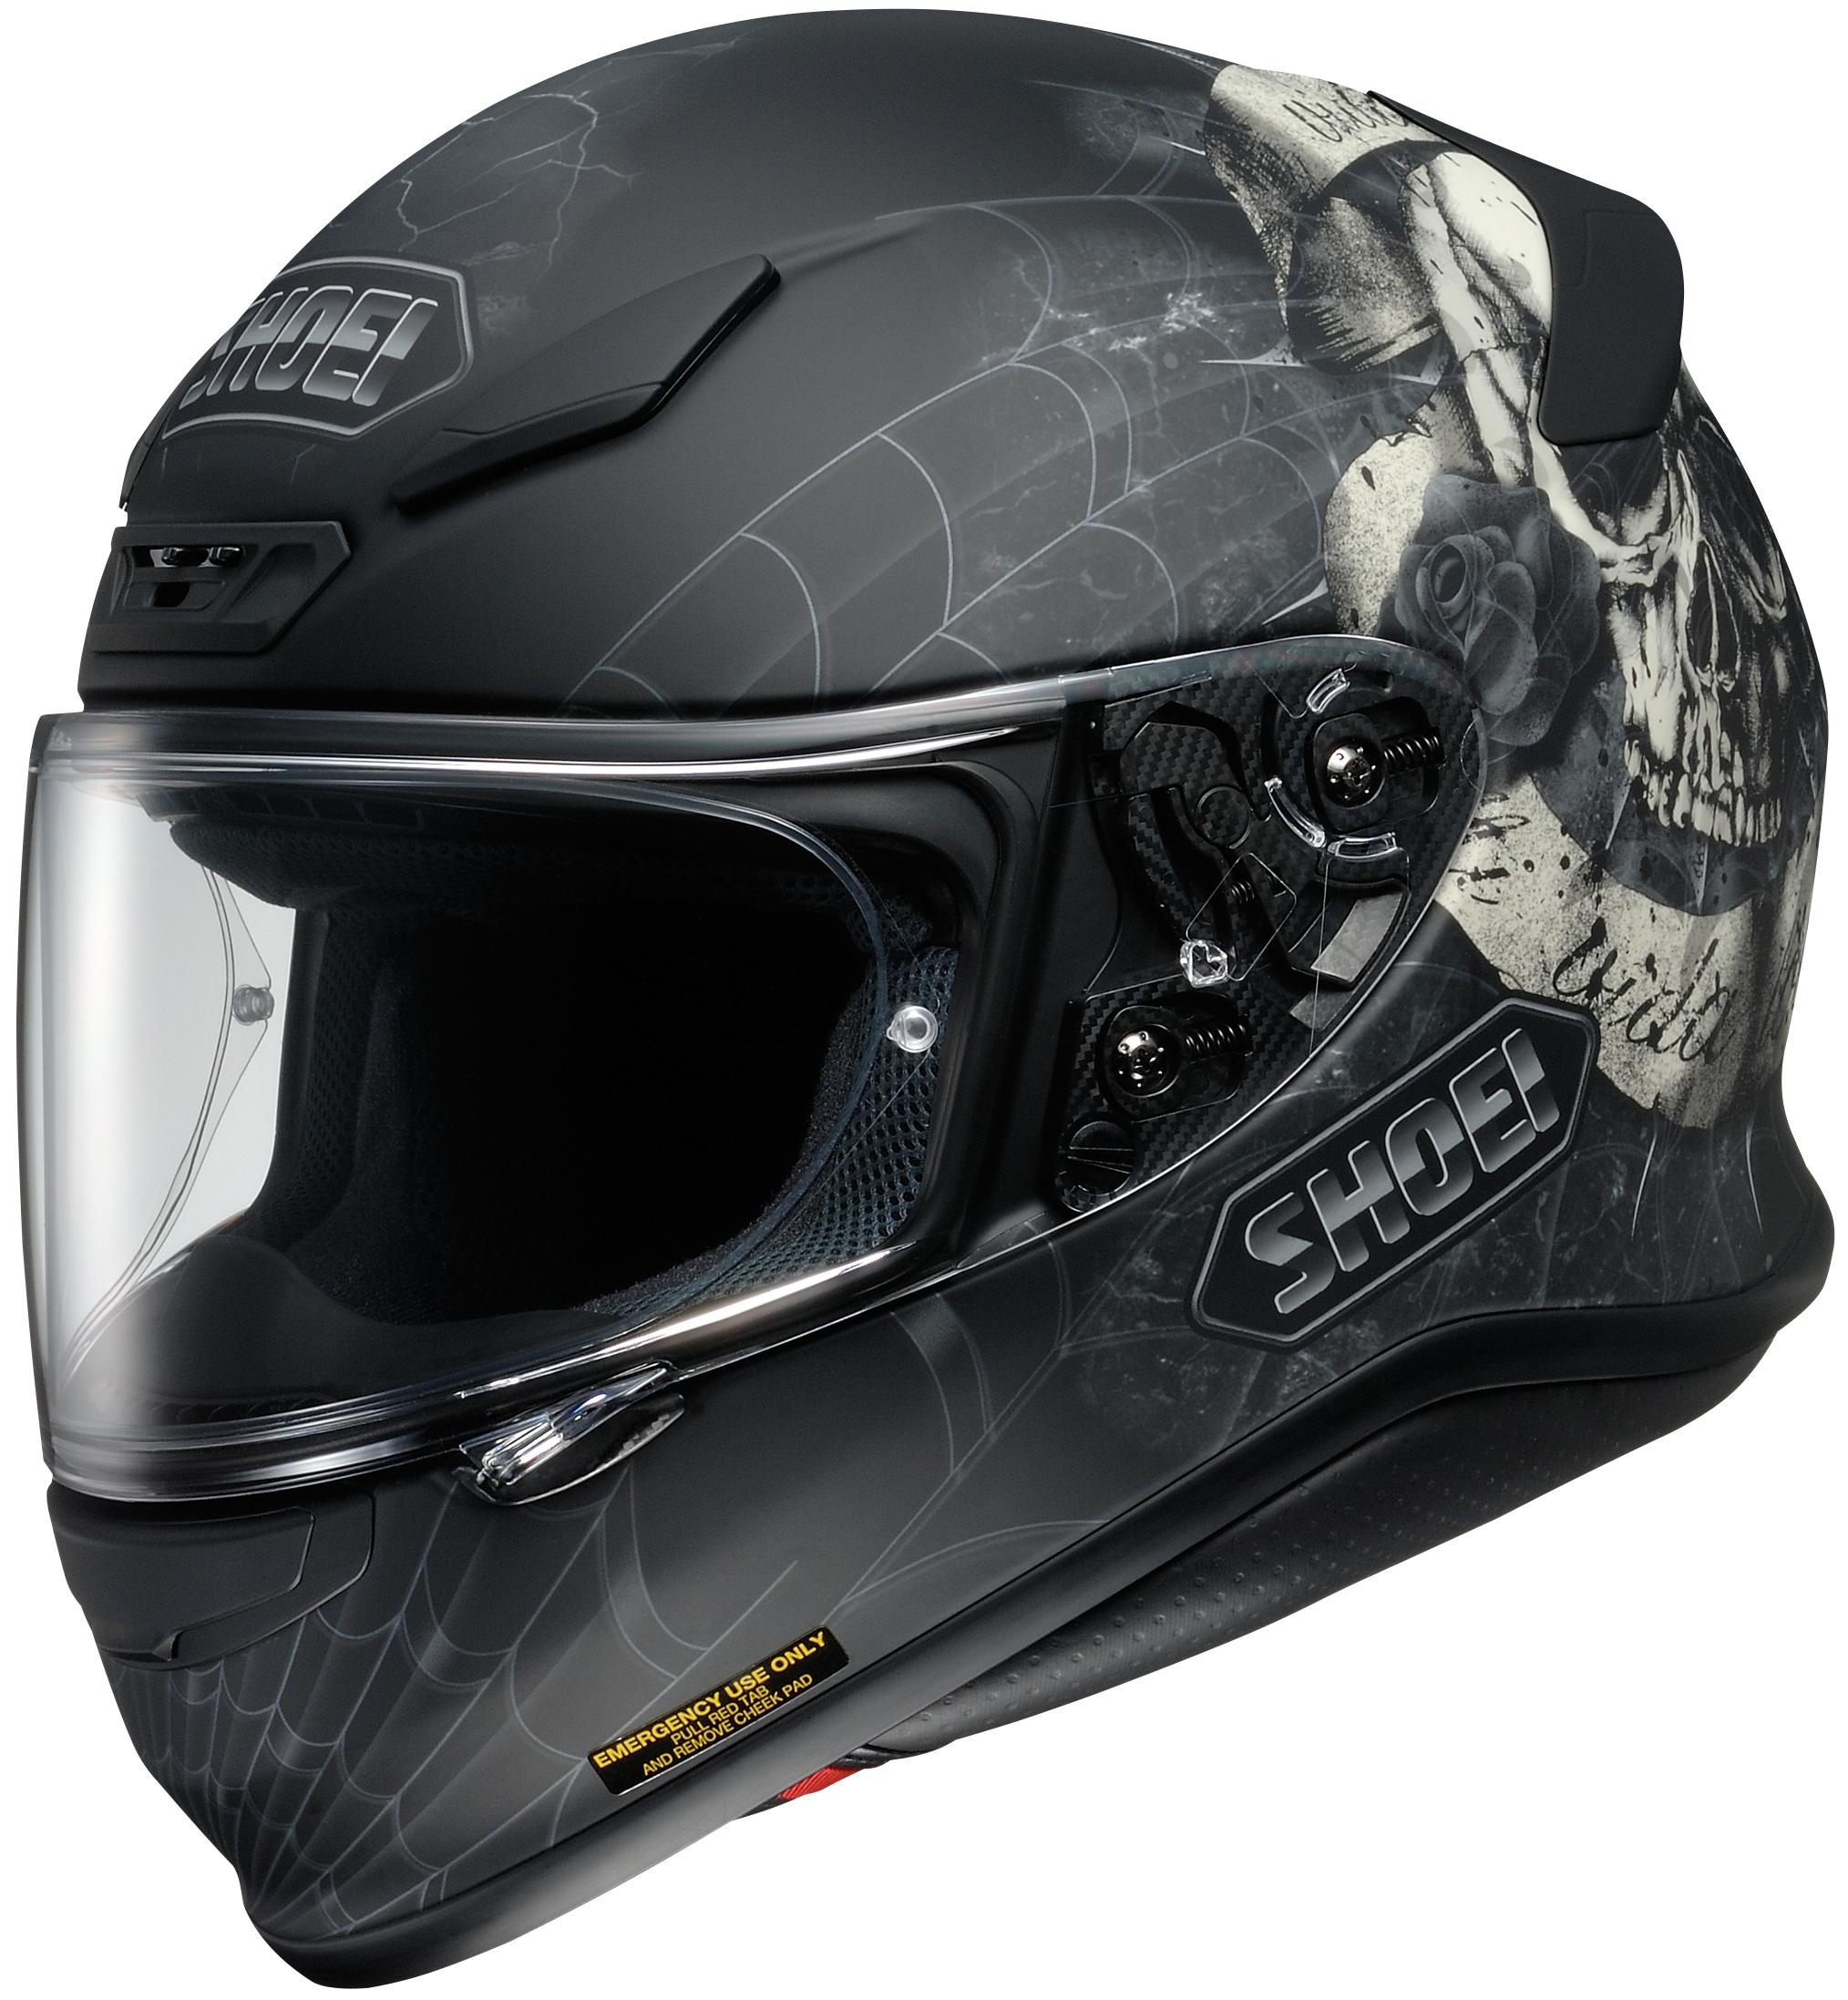 SHOEI RF Graphics - Motorcycle half helmet decalscustom motorcycle helmet decals and motorcycle helmet stickers